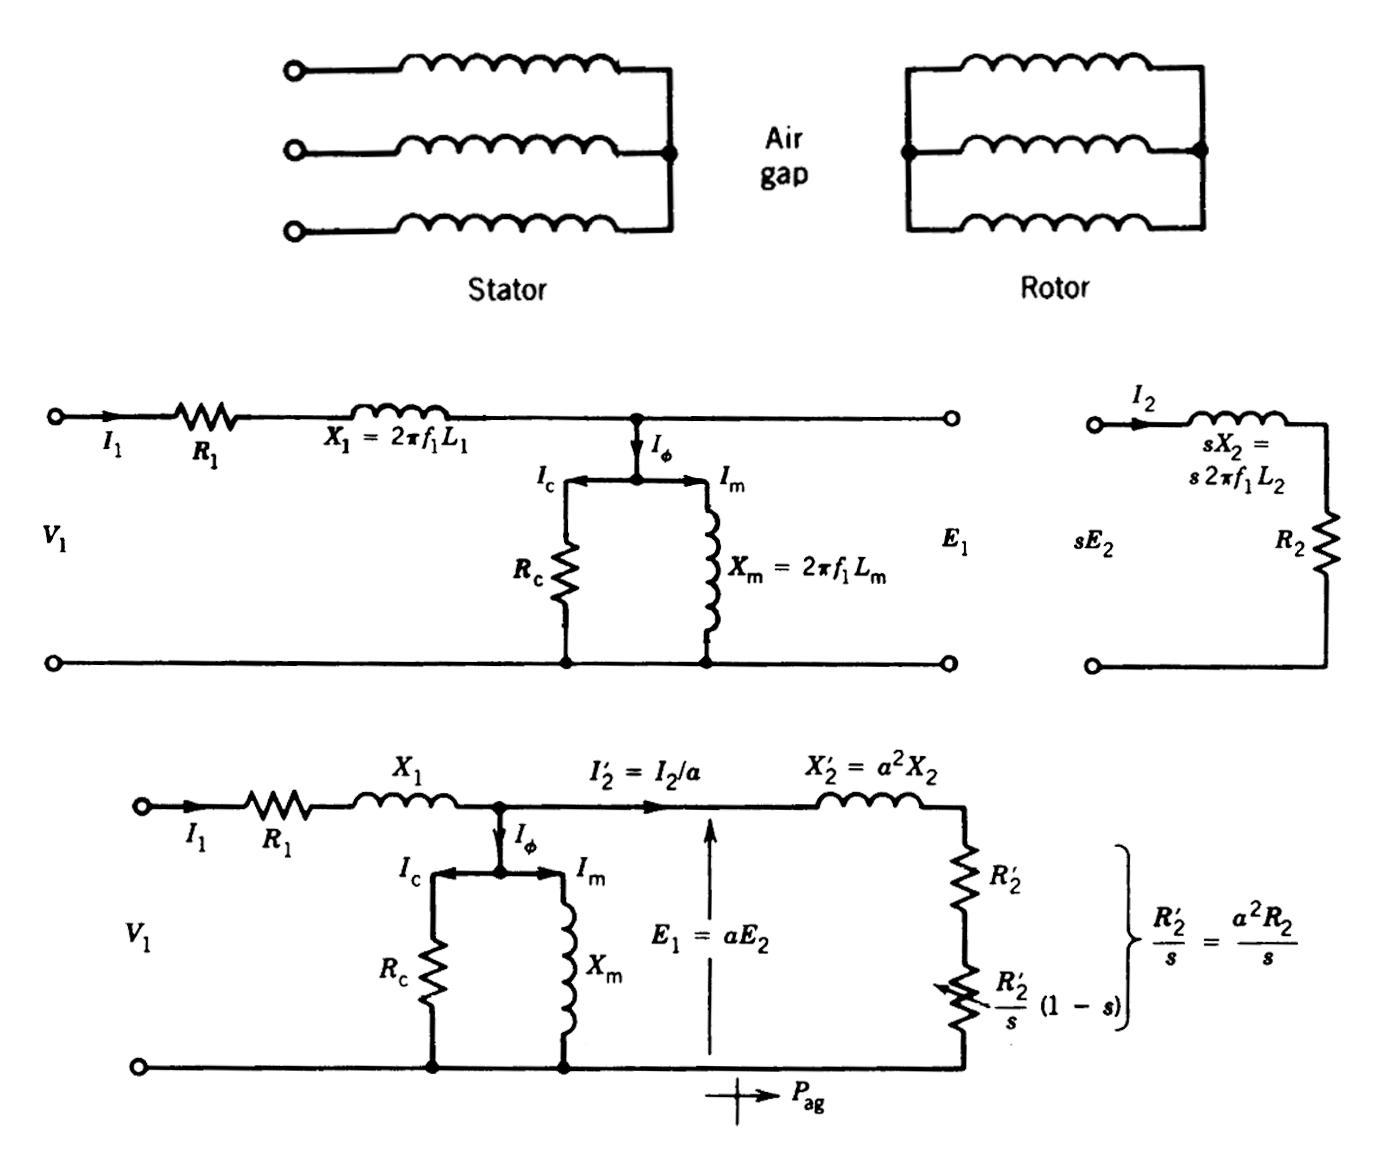 Equivalent Circuit Model of IM-1